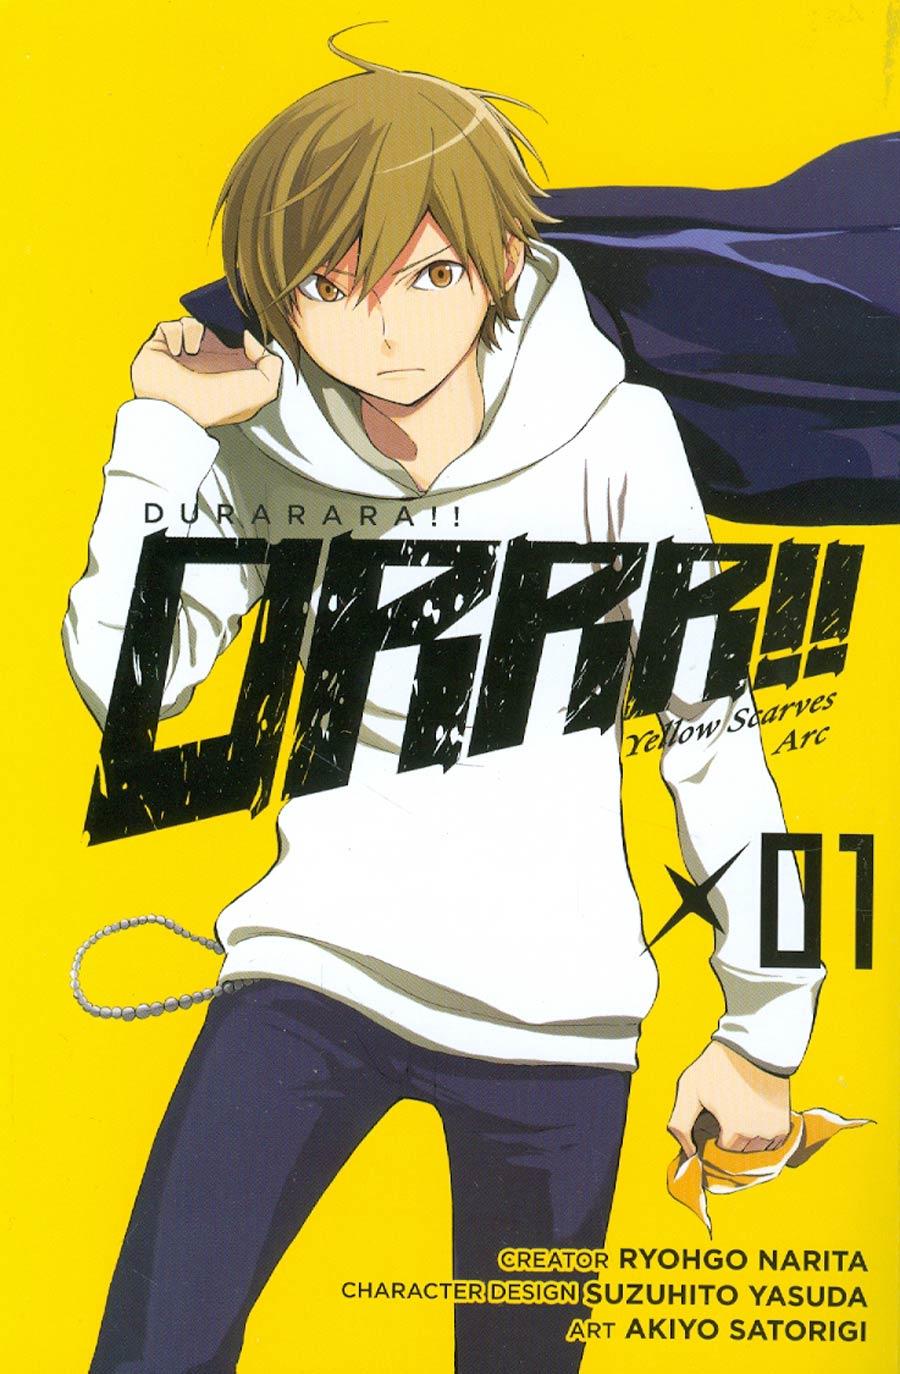 Durarara Yellow Scarves Arc Vol 1 TP